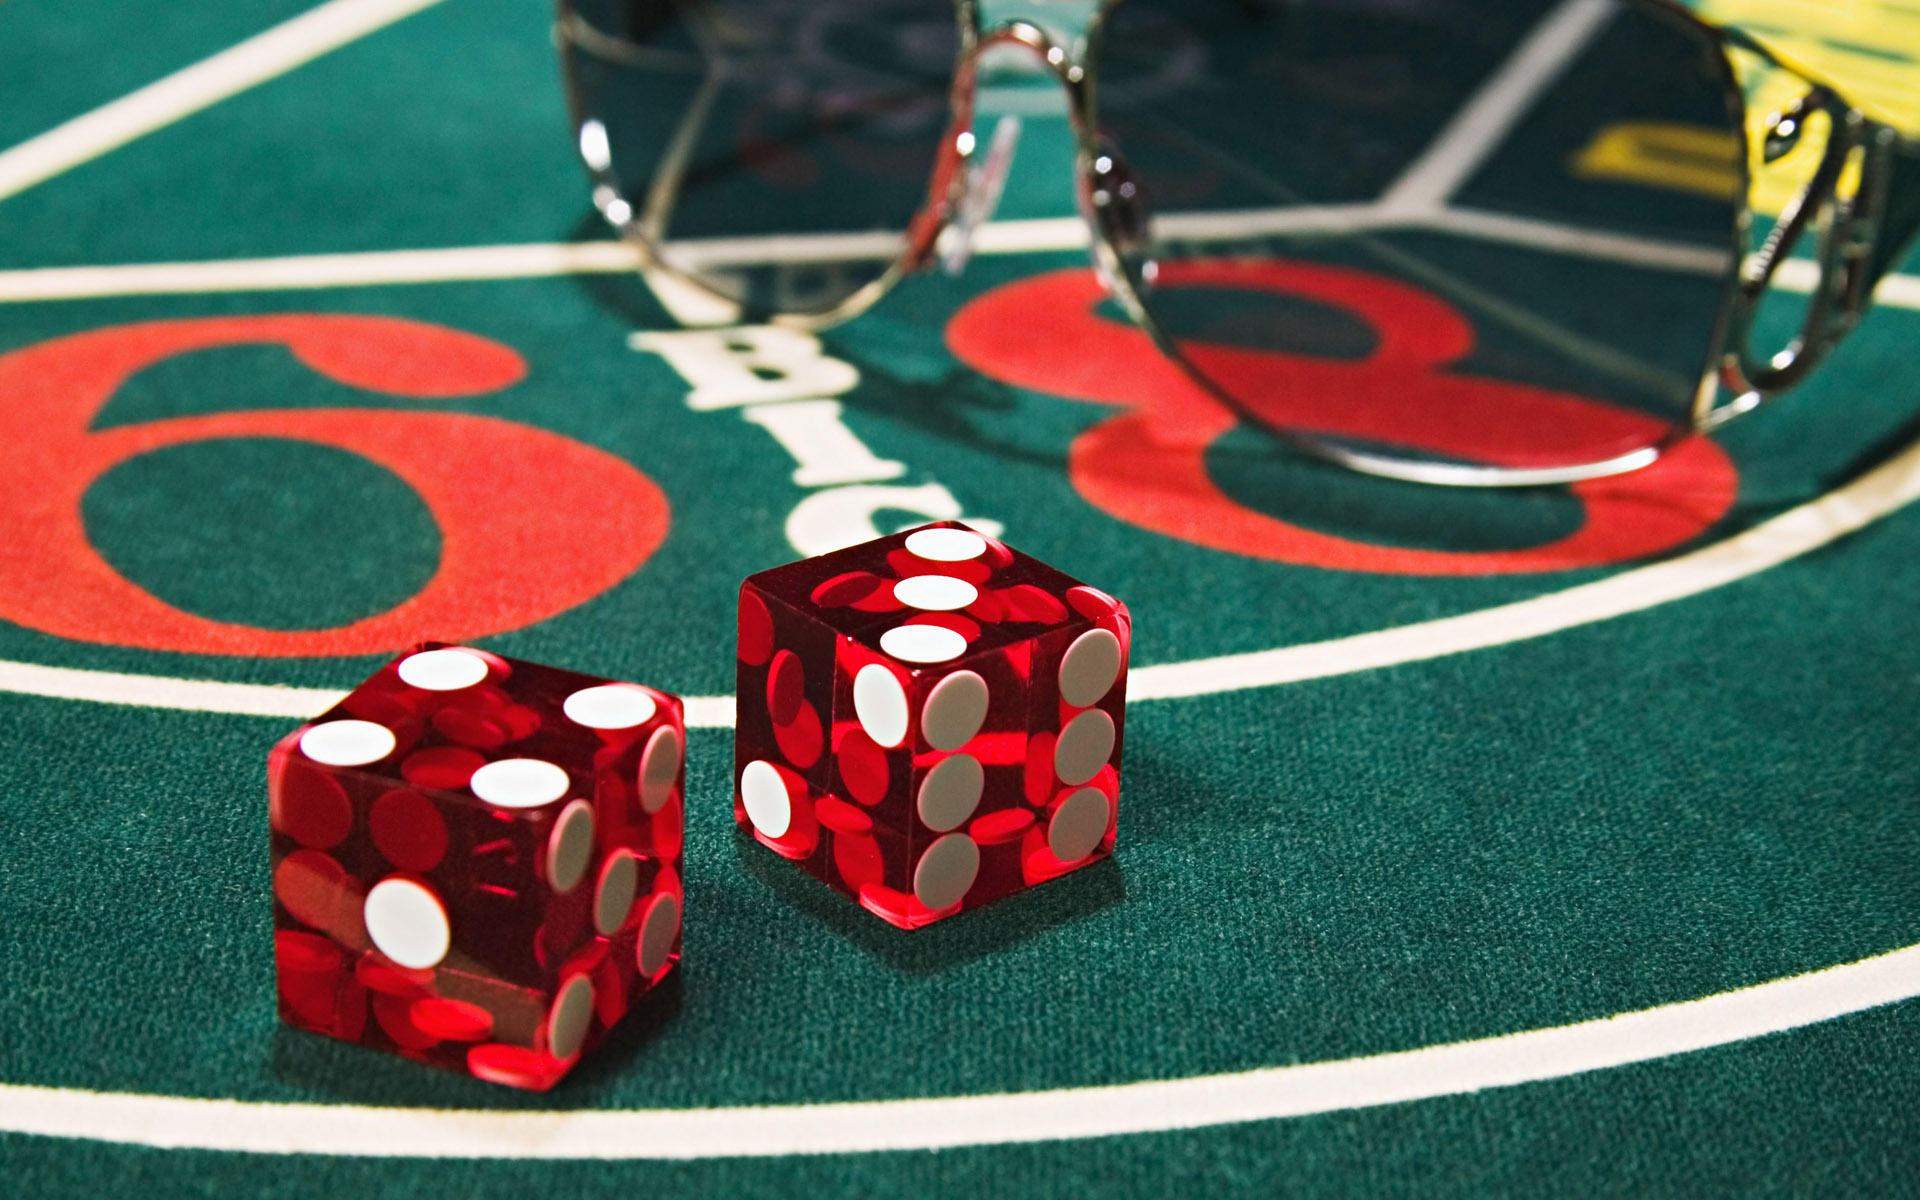 PBNs SEO Backlinks 50 Judi Bola,  Casino Online,  Poker Online,  Gambling Sites Google Ranking Help